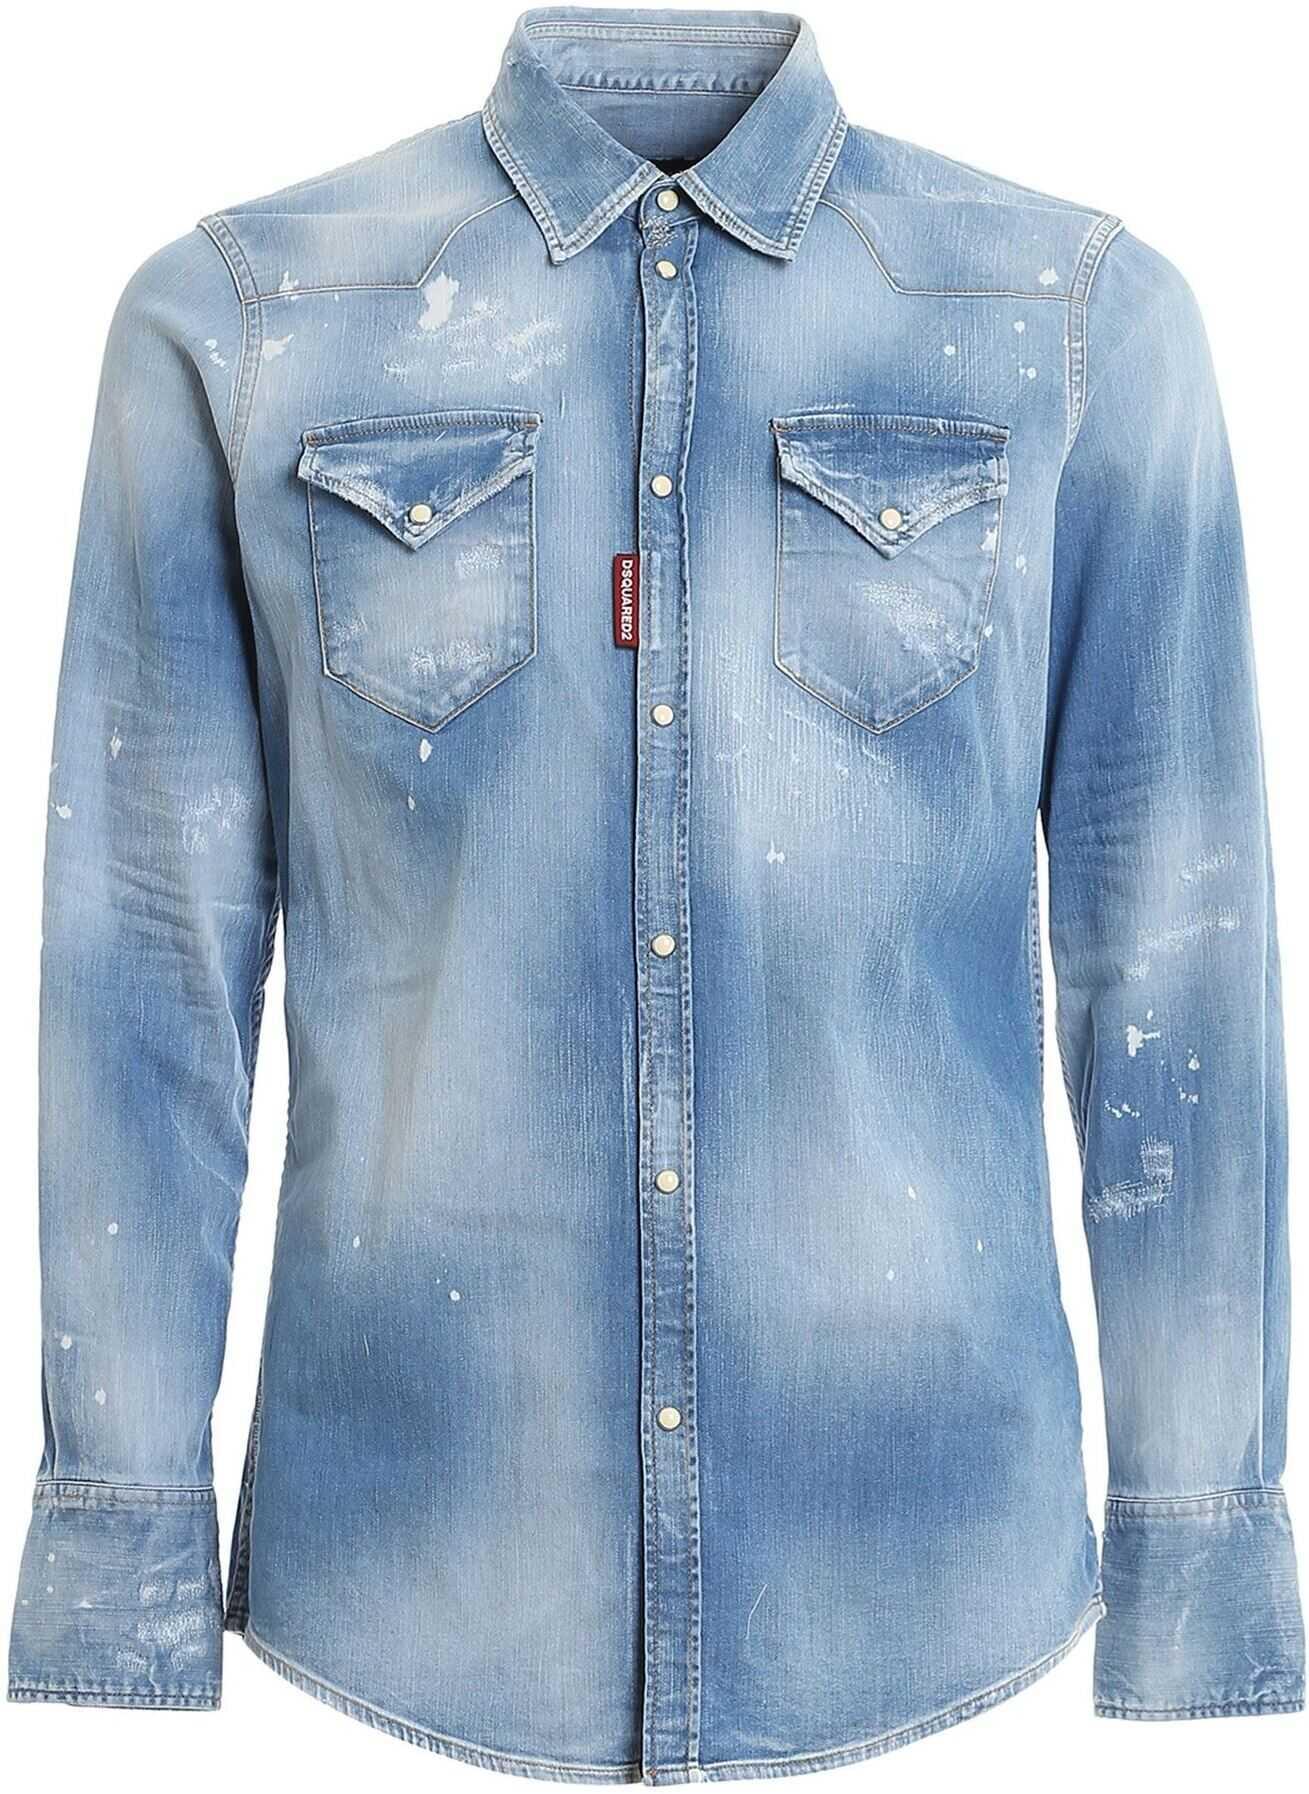 DSQUARED2 Faded Denim Shirt In Blue Light Blue imagine